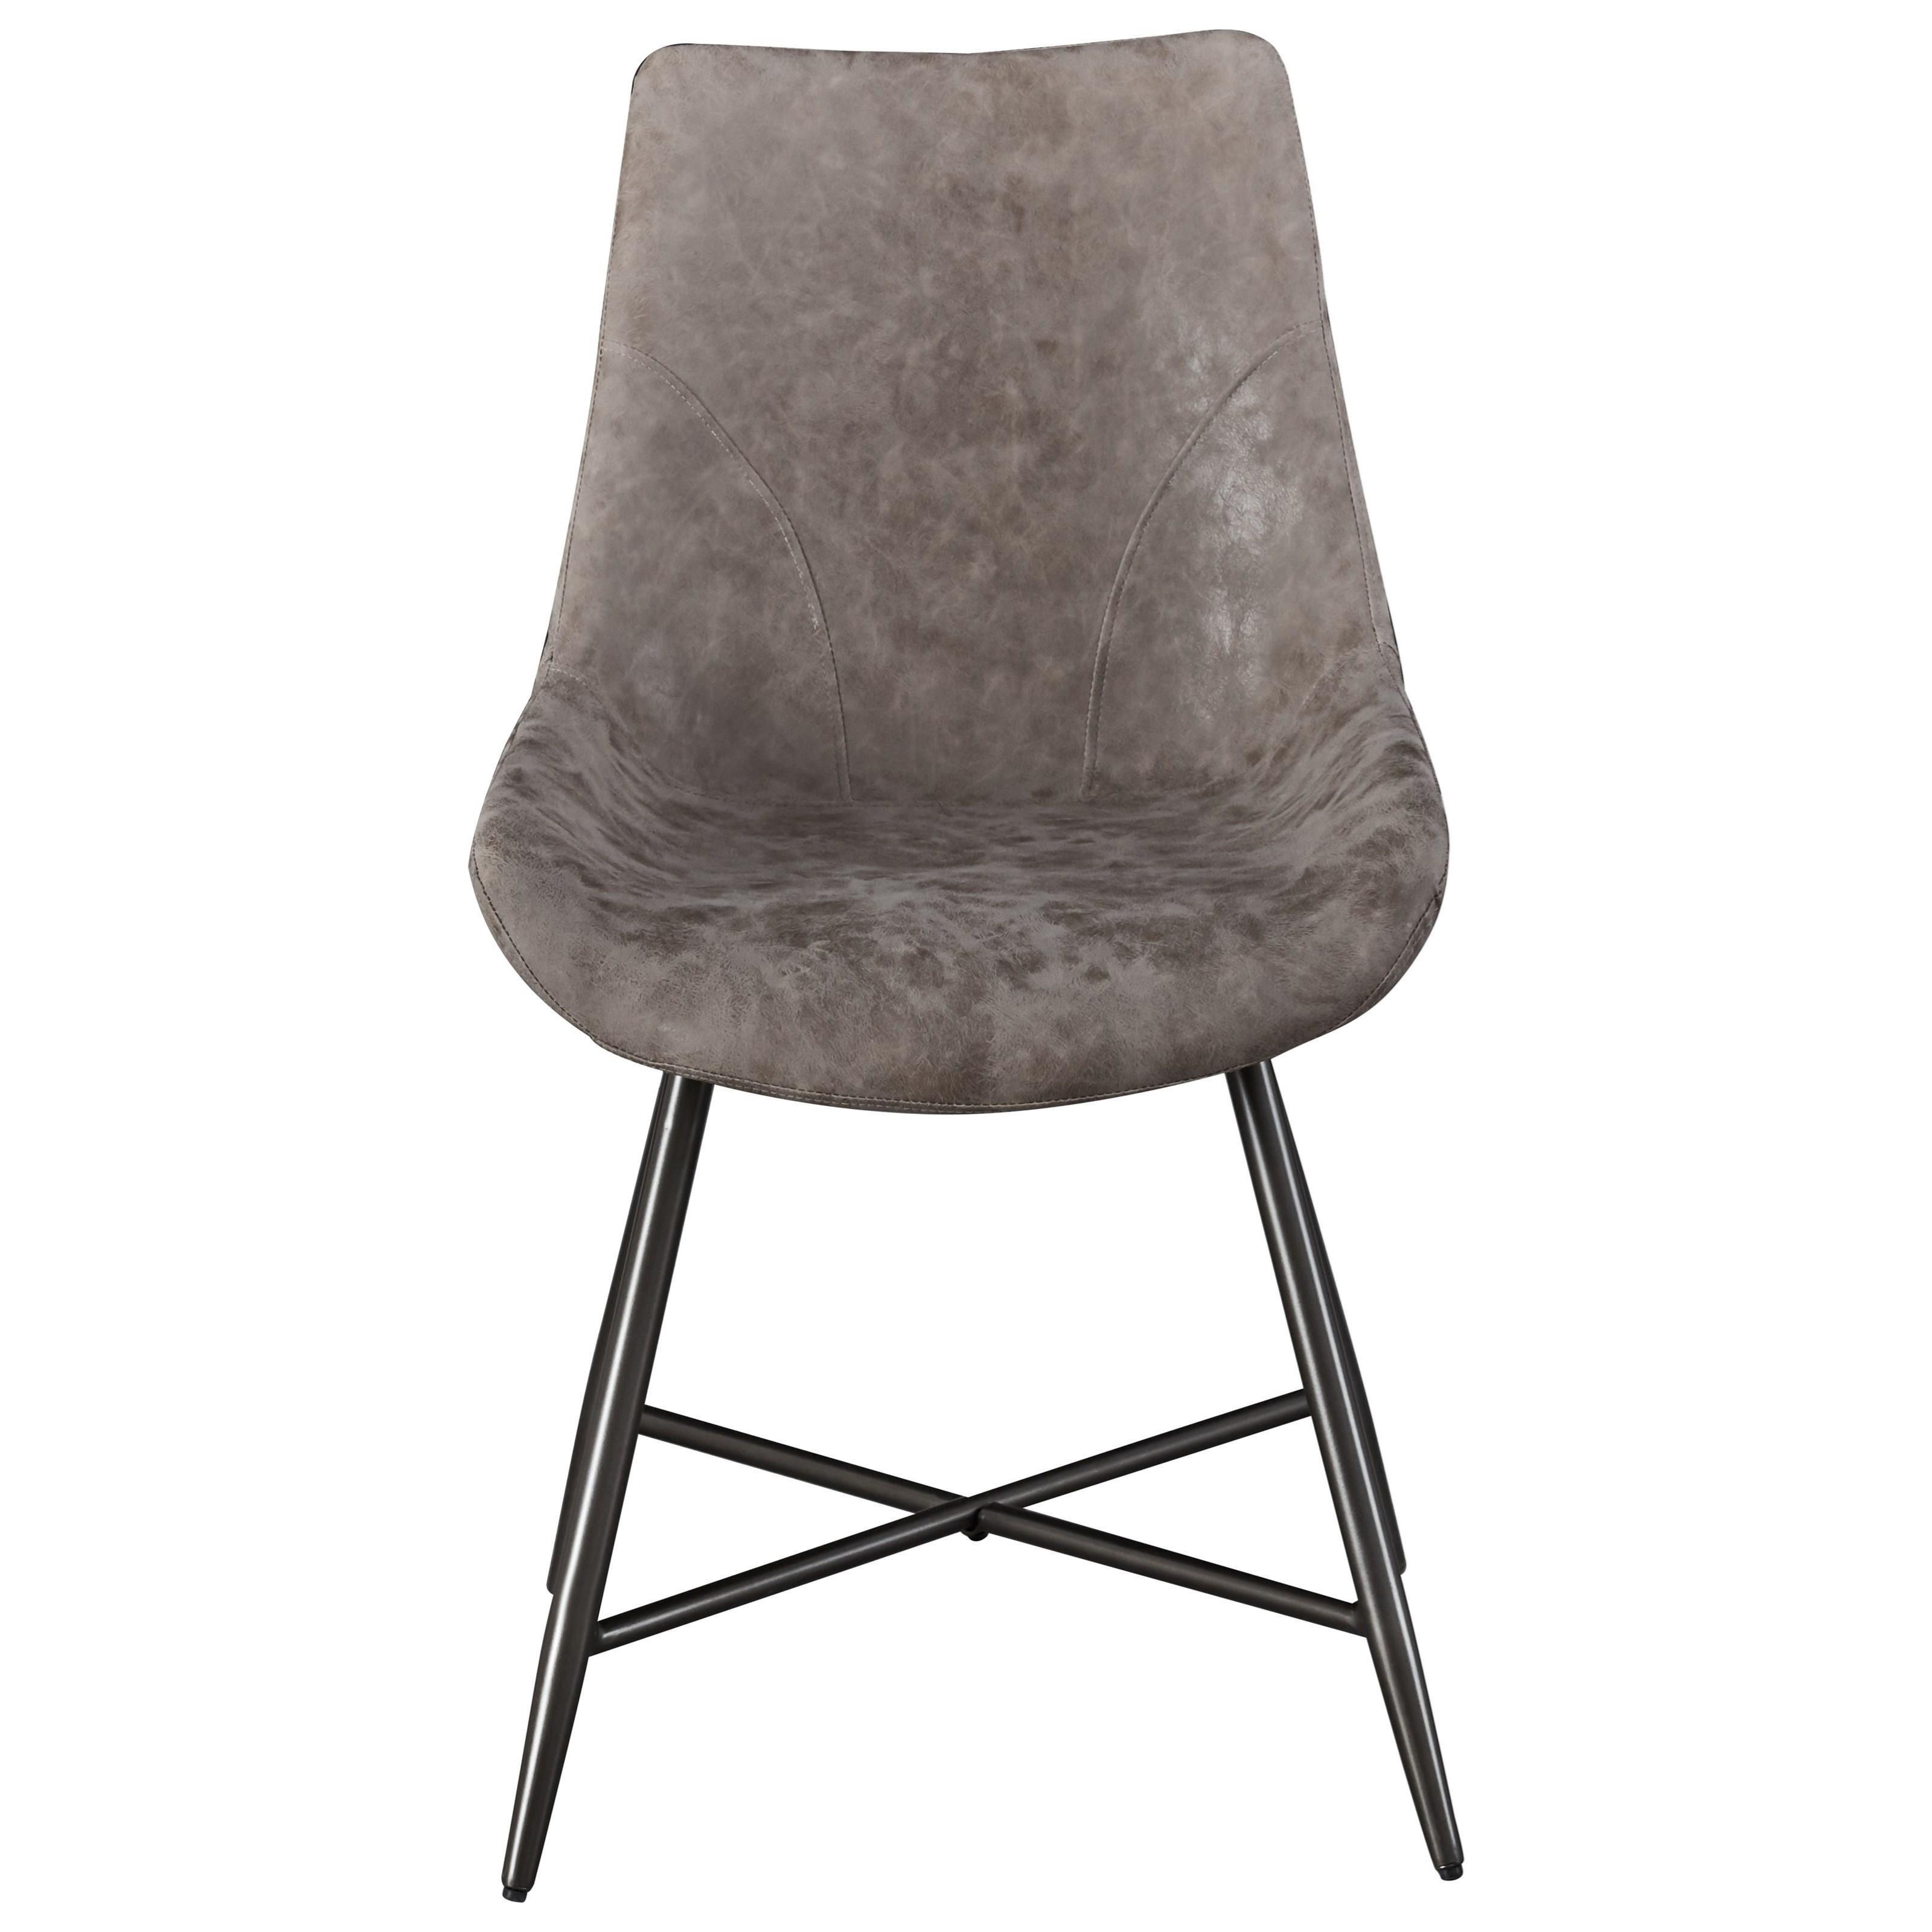 Ramona Faux Rawhide Side Chair by Steve Silver at Walker's Furniture